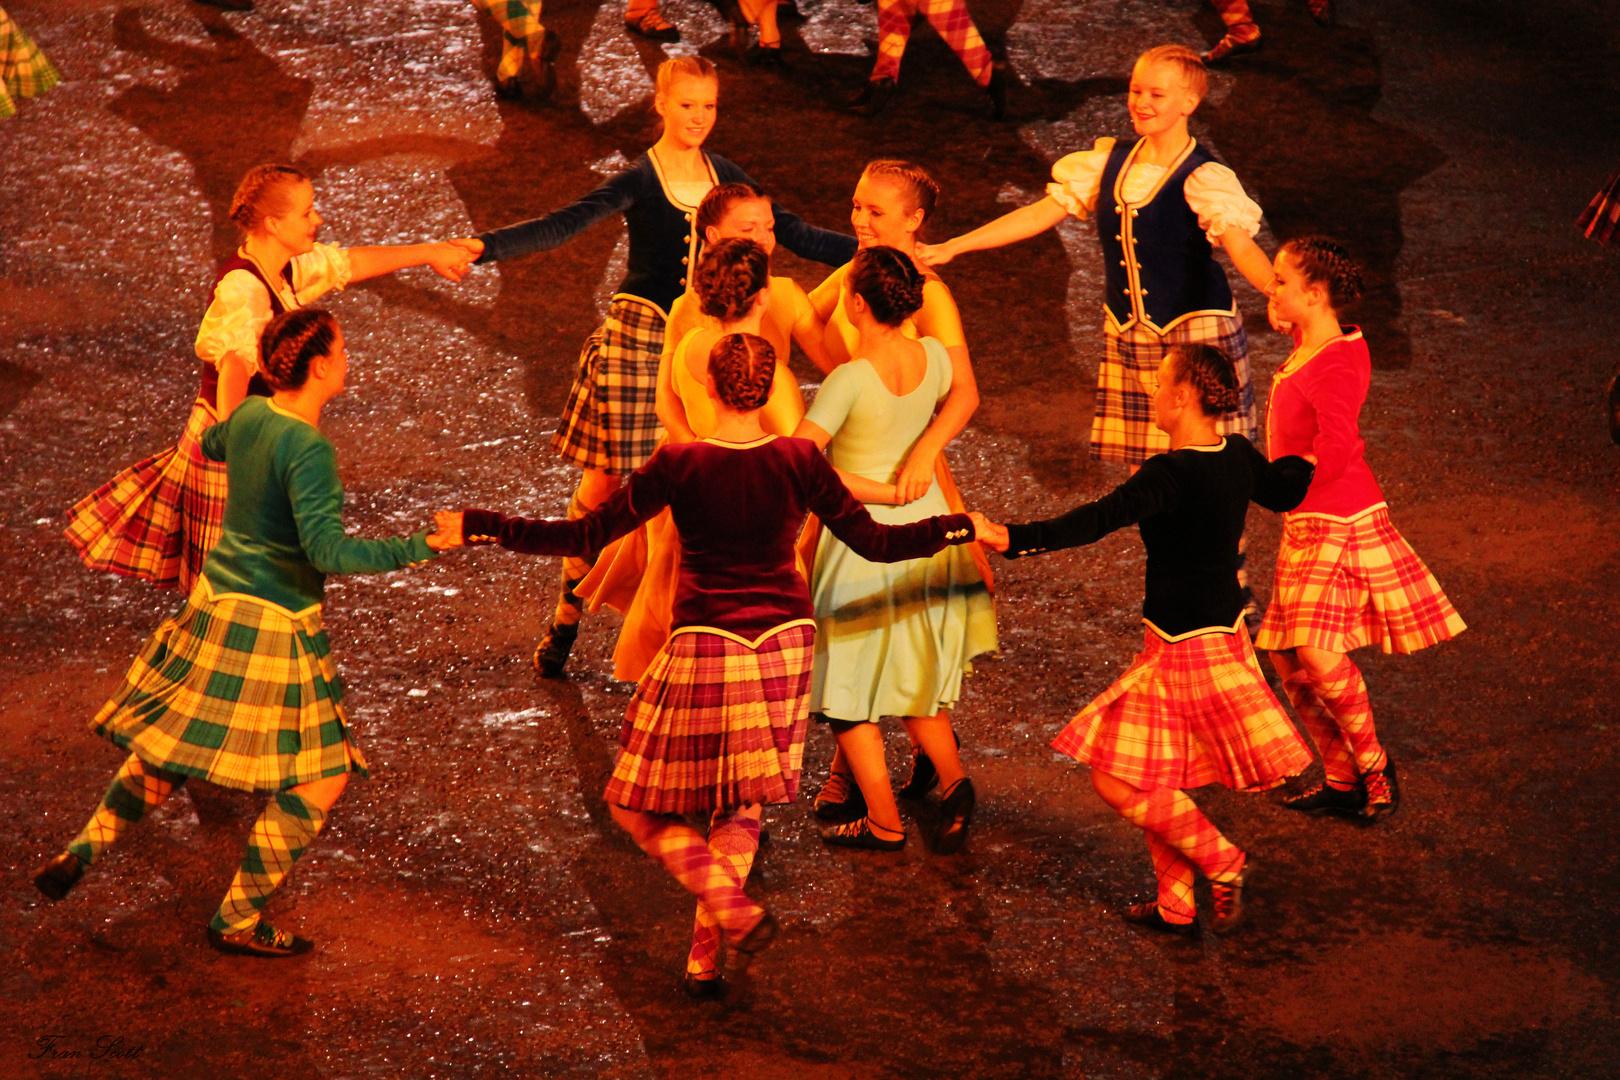 Experience my Scotland LIV: The Rythem of Life